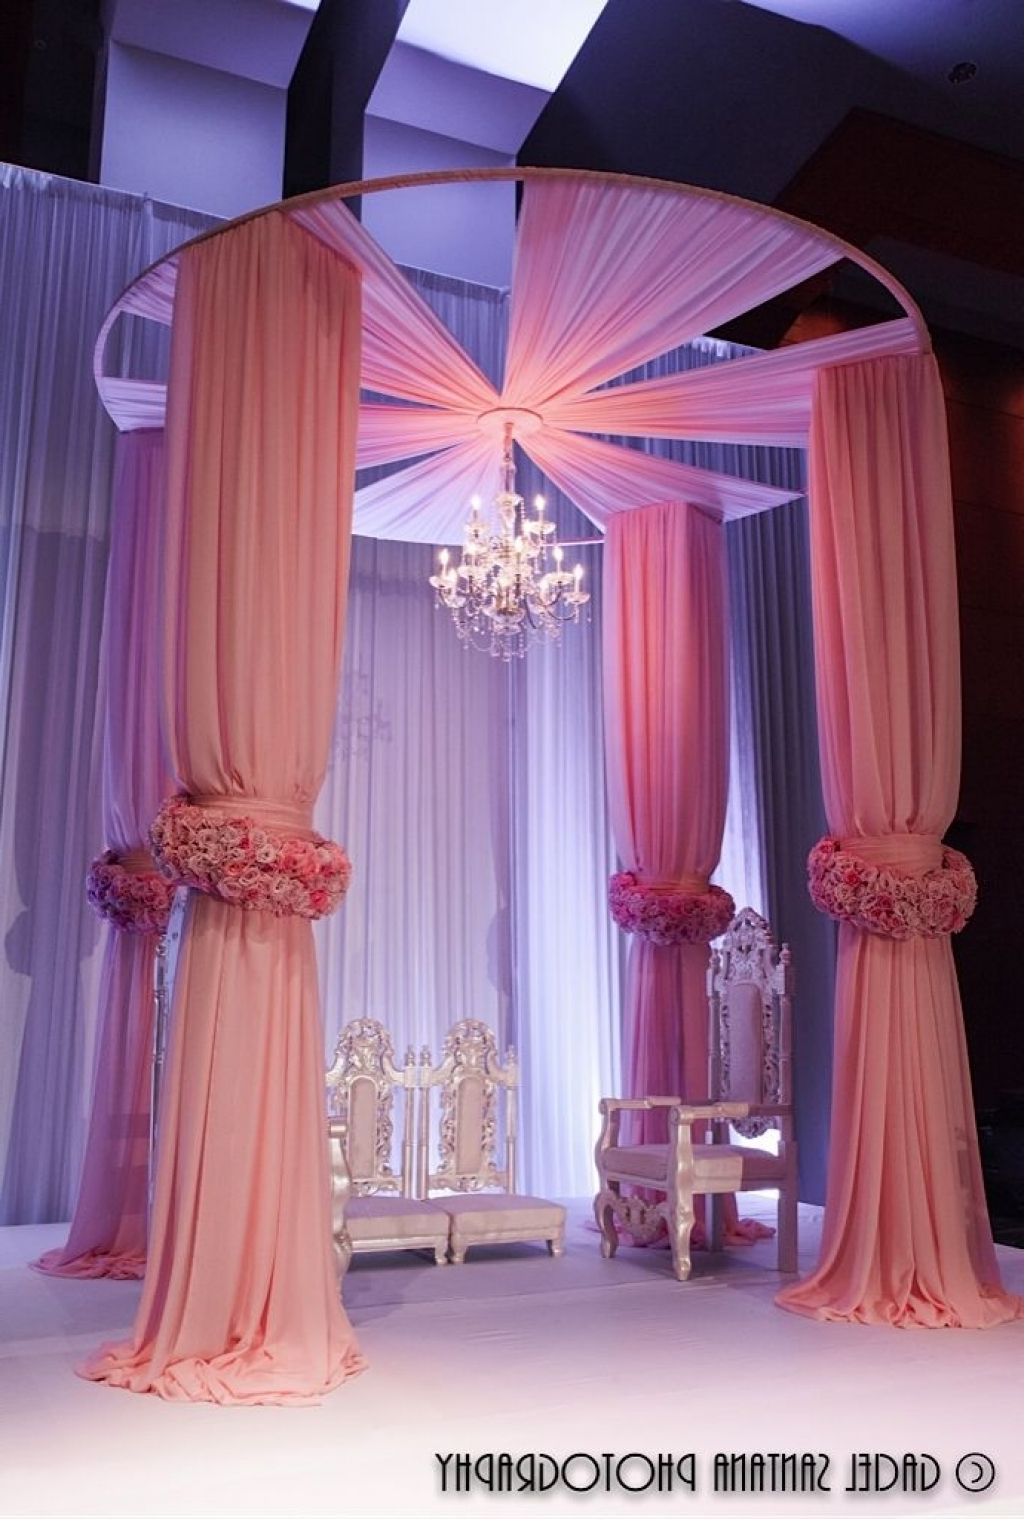 indian wedding decor ideas mandap decoration wedding decor wedding themes decorations wedding. Black Bedroom Furniture Sets. Home Design Ideas